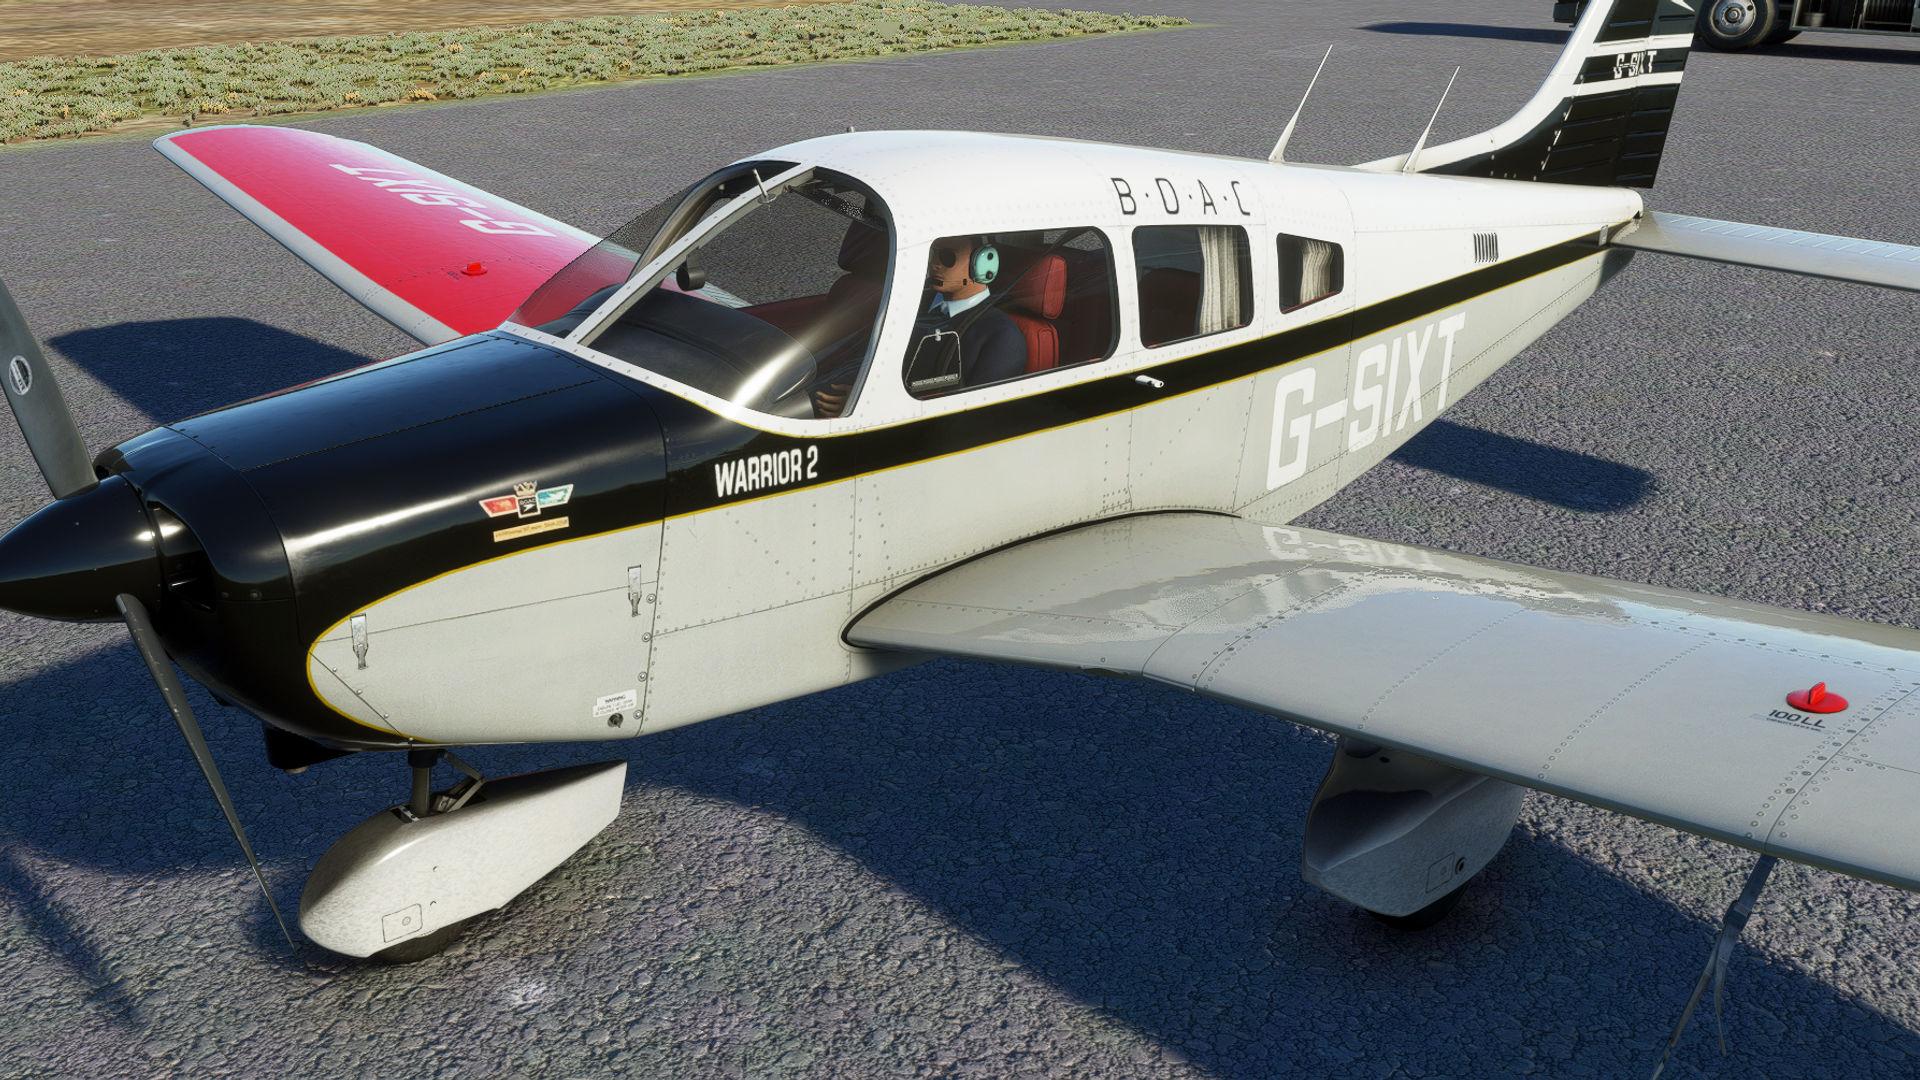 Microsoft Flight Simulator Just Flight Piper Warrior Ii Wip 2